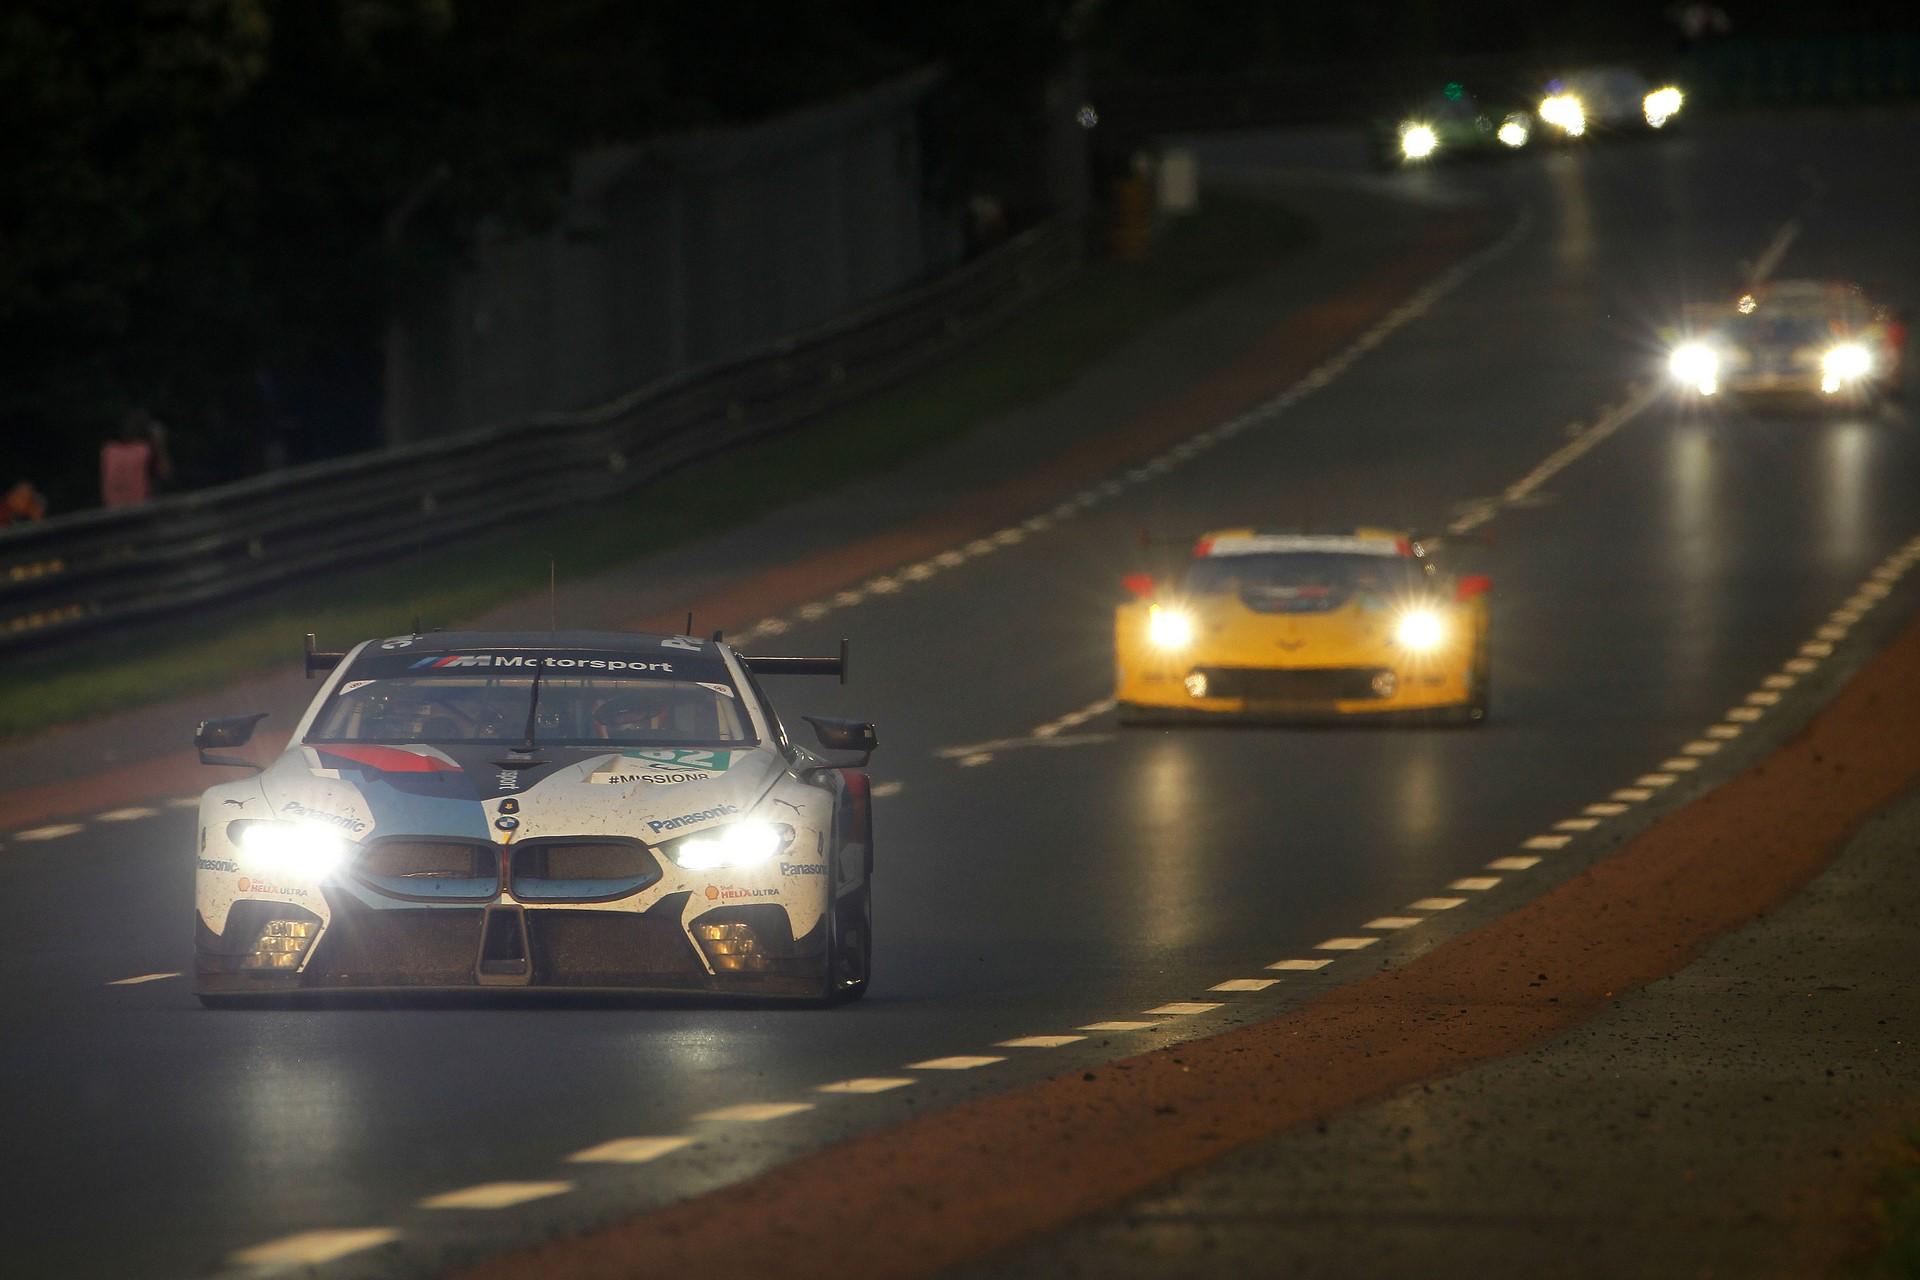 Le Mans (FRA), 16th June 2018. BMW M Motorsport, FIA World Endurance Championship (WEC), 24 Hours of Le Mans, #82 BMW M8 GTE, António Félix da Costa (POR), Alexander Sims (GRB), Augusto Farfus (BRA).